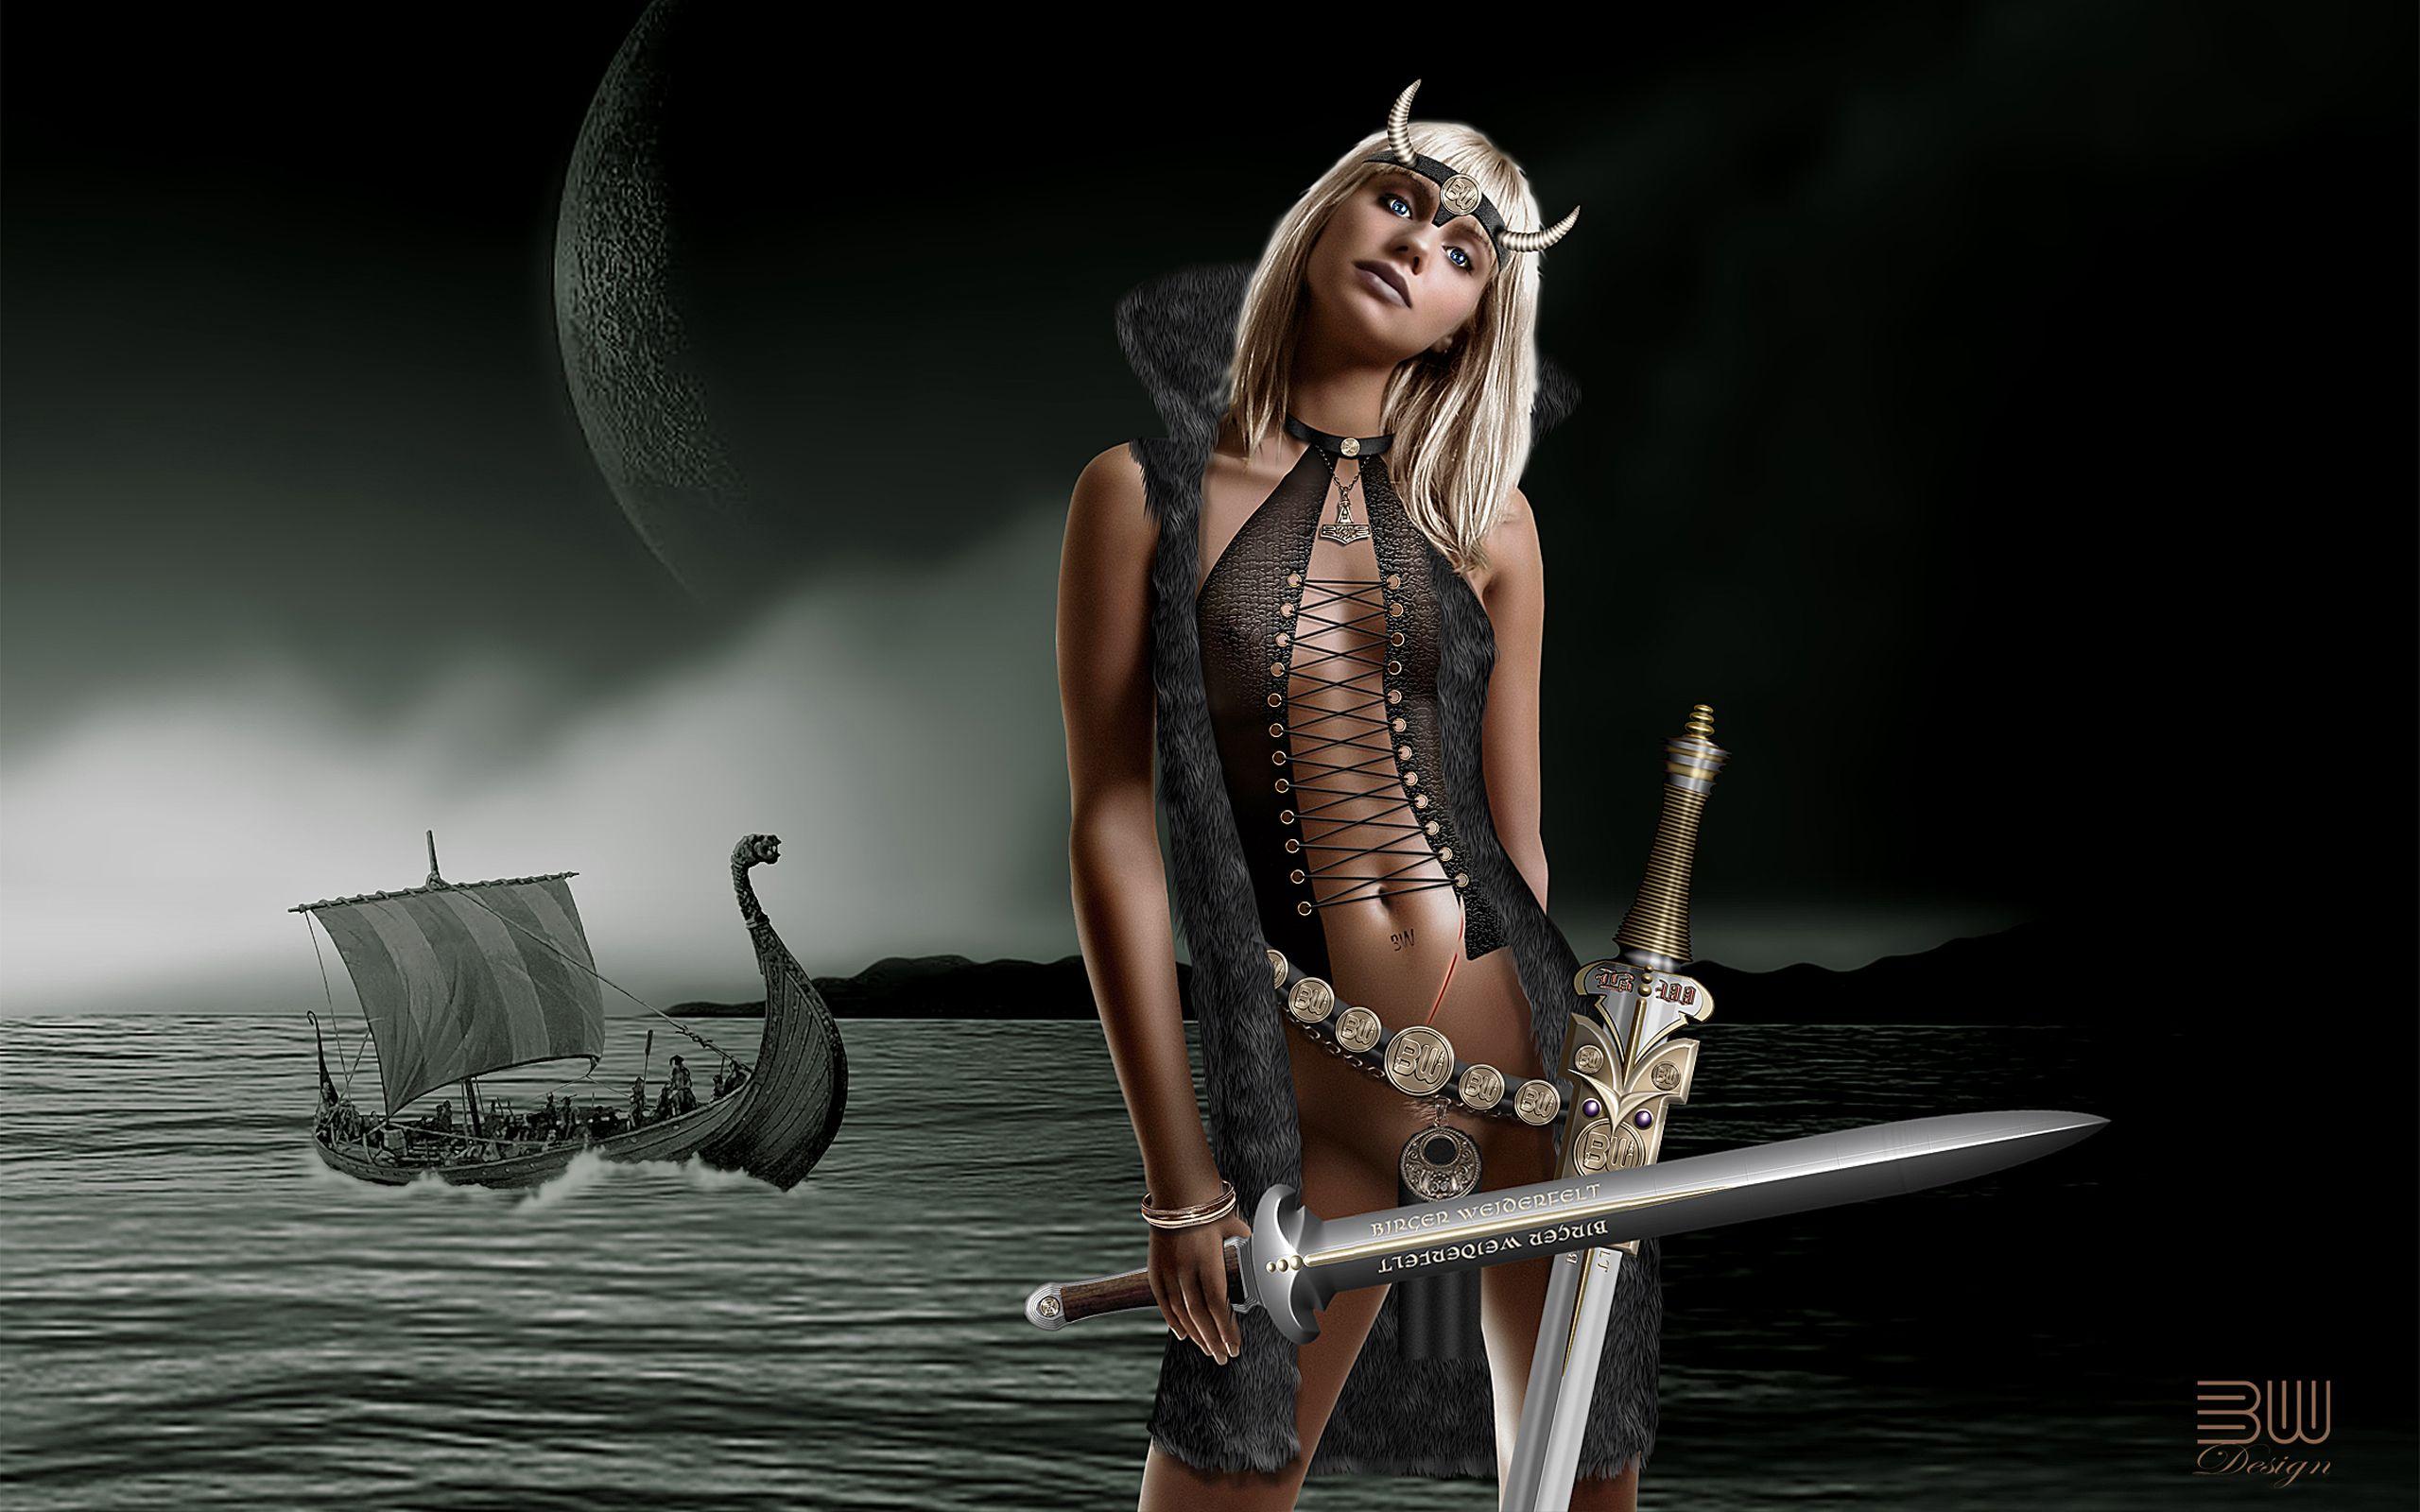 hot viking woman